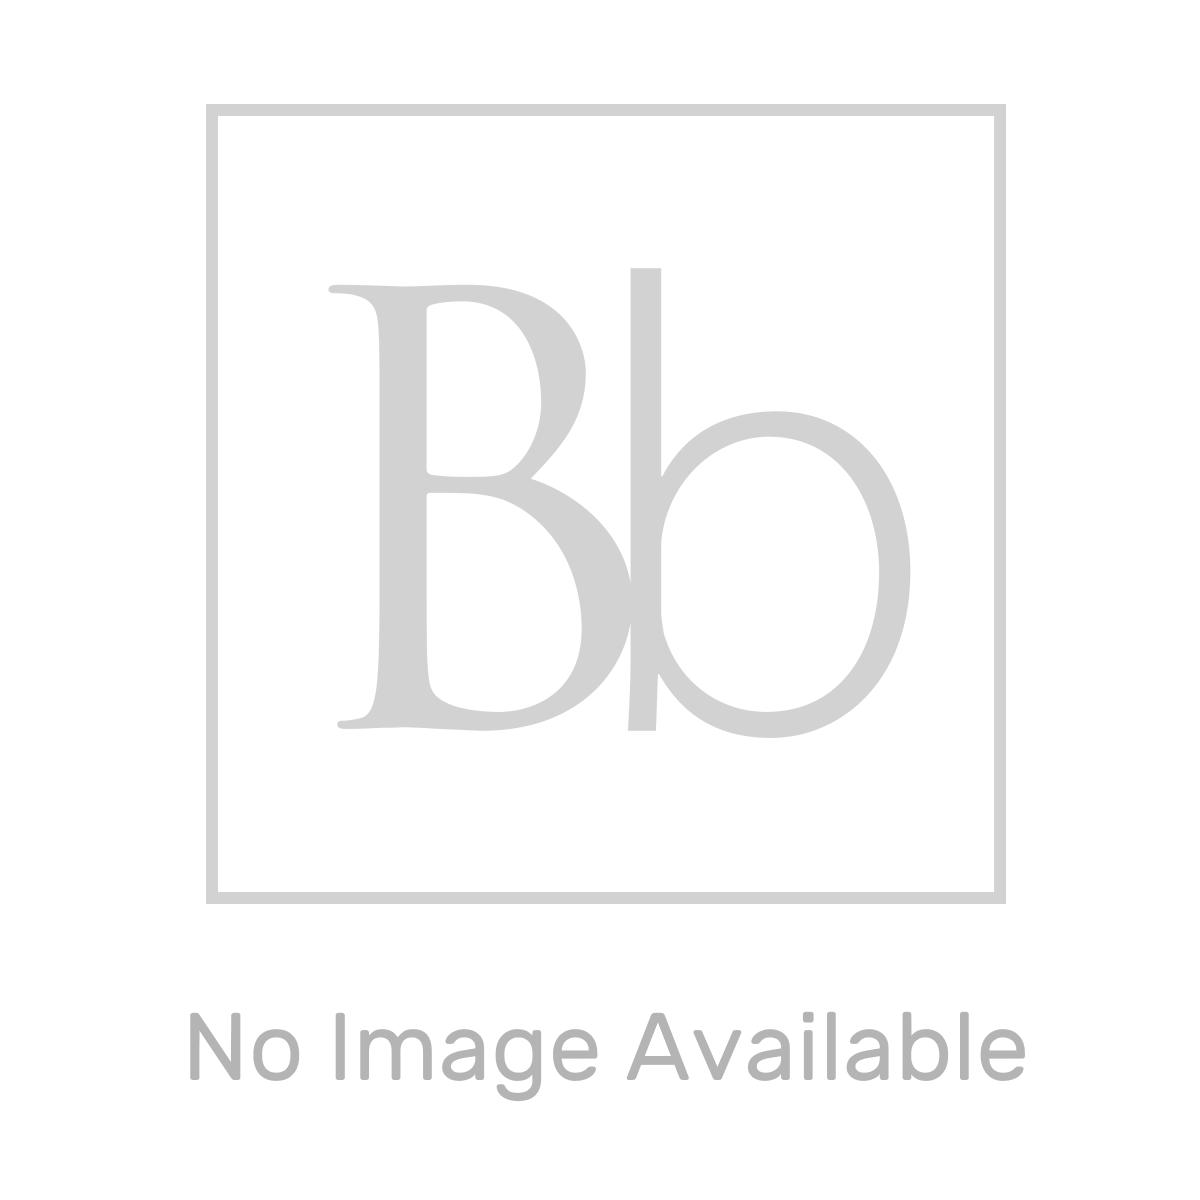 RAK Compact Basin with Full Pedestal 460mm